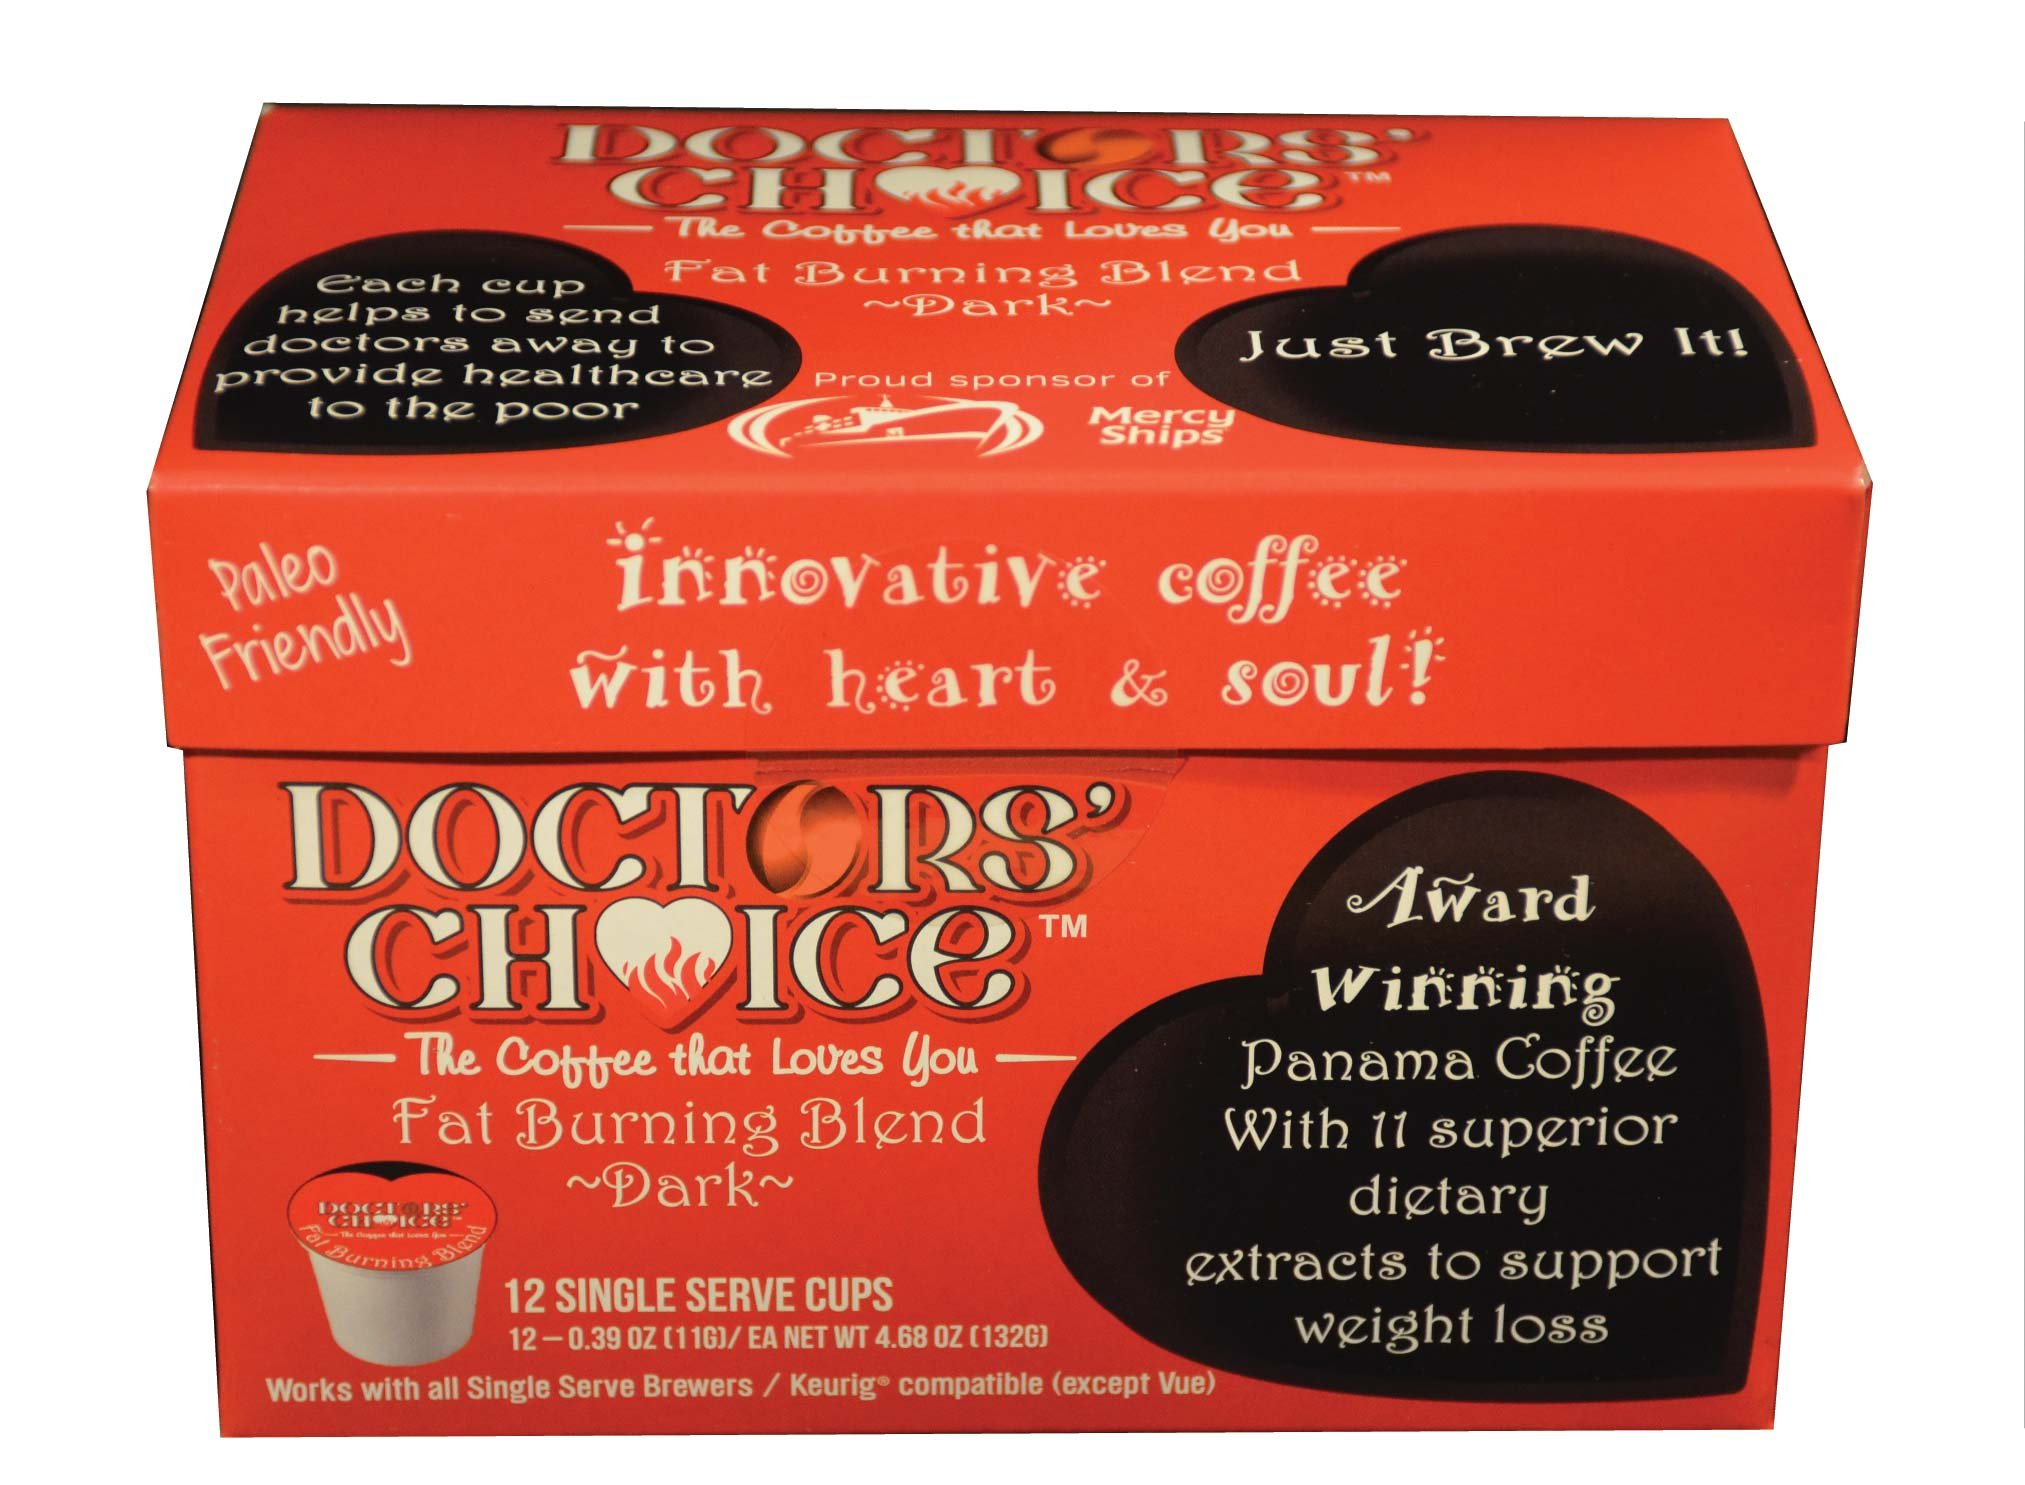 Doctors Choice Detoxifying & Antioxidant ''Fat Burning Coffee'' (12 Count)